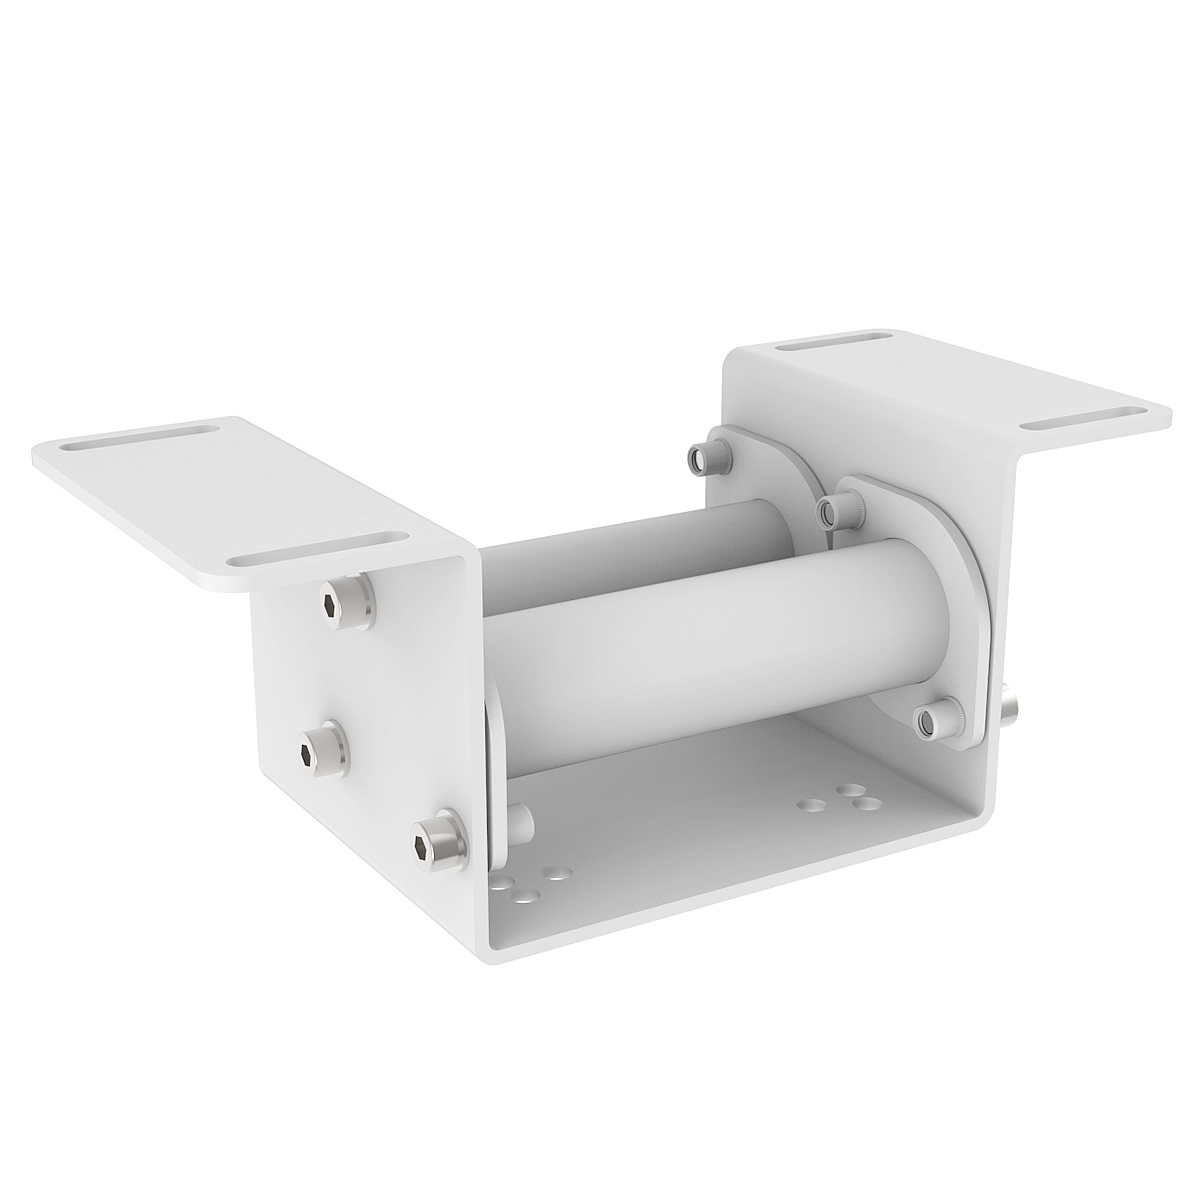 B1 / P1 / C1 Buttkicker mount Upgrade kit White